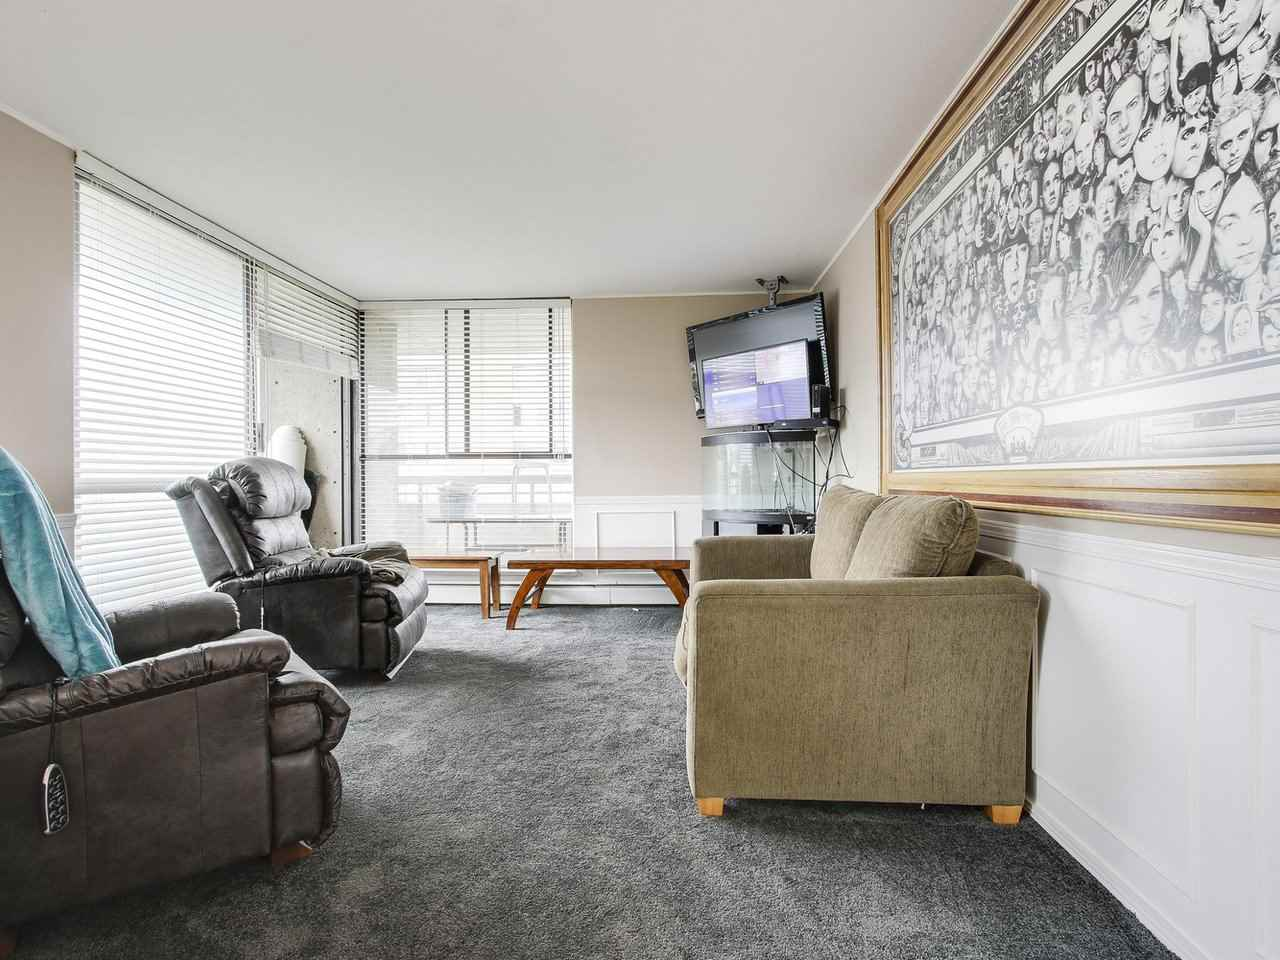 Condo Apartment at 905 3755 BARTLETT COURT, Unit 905, Burnaby North, British Columbia. Image 6